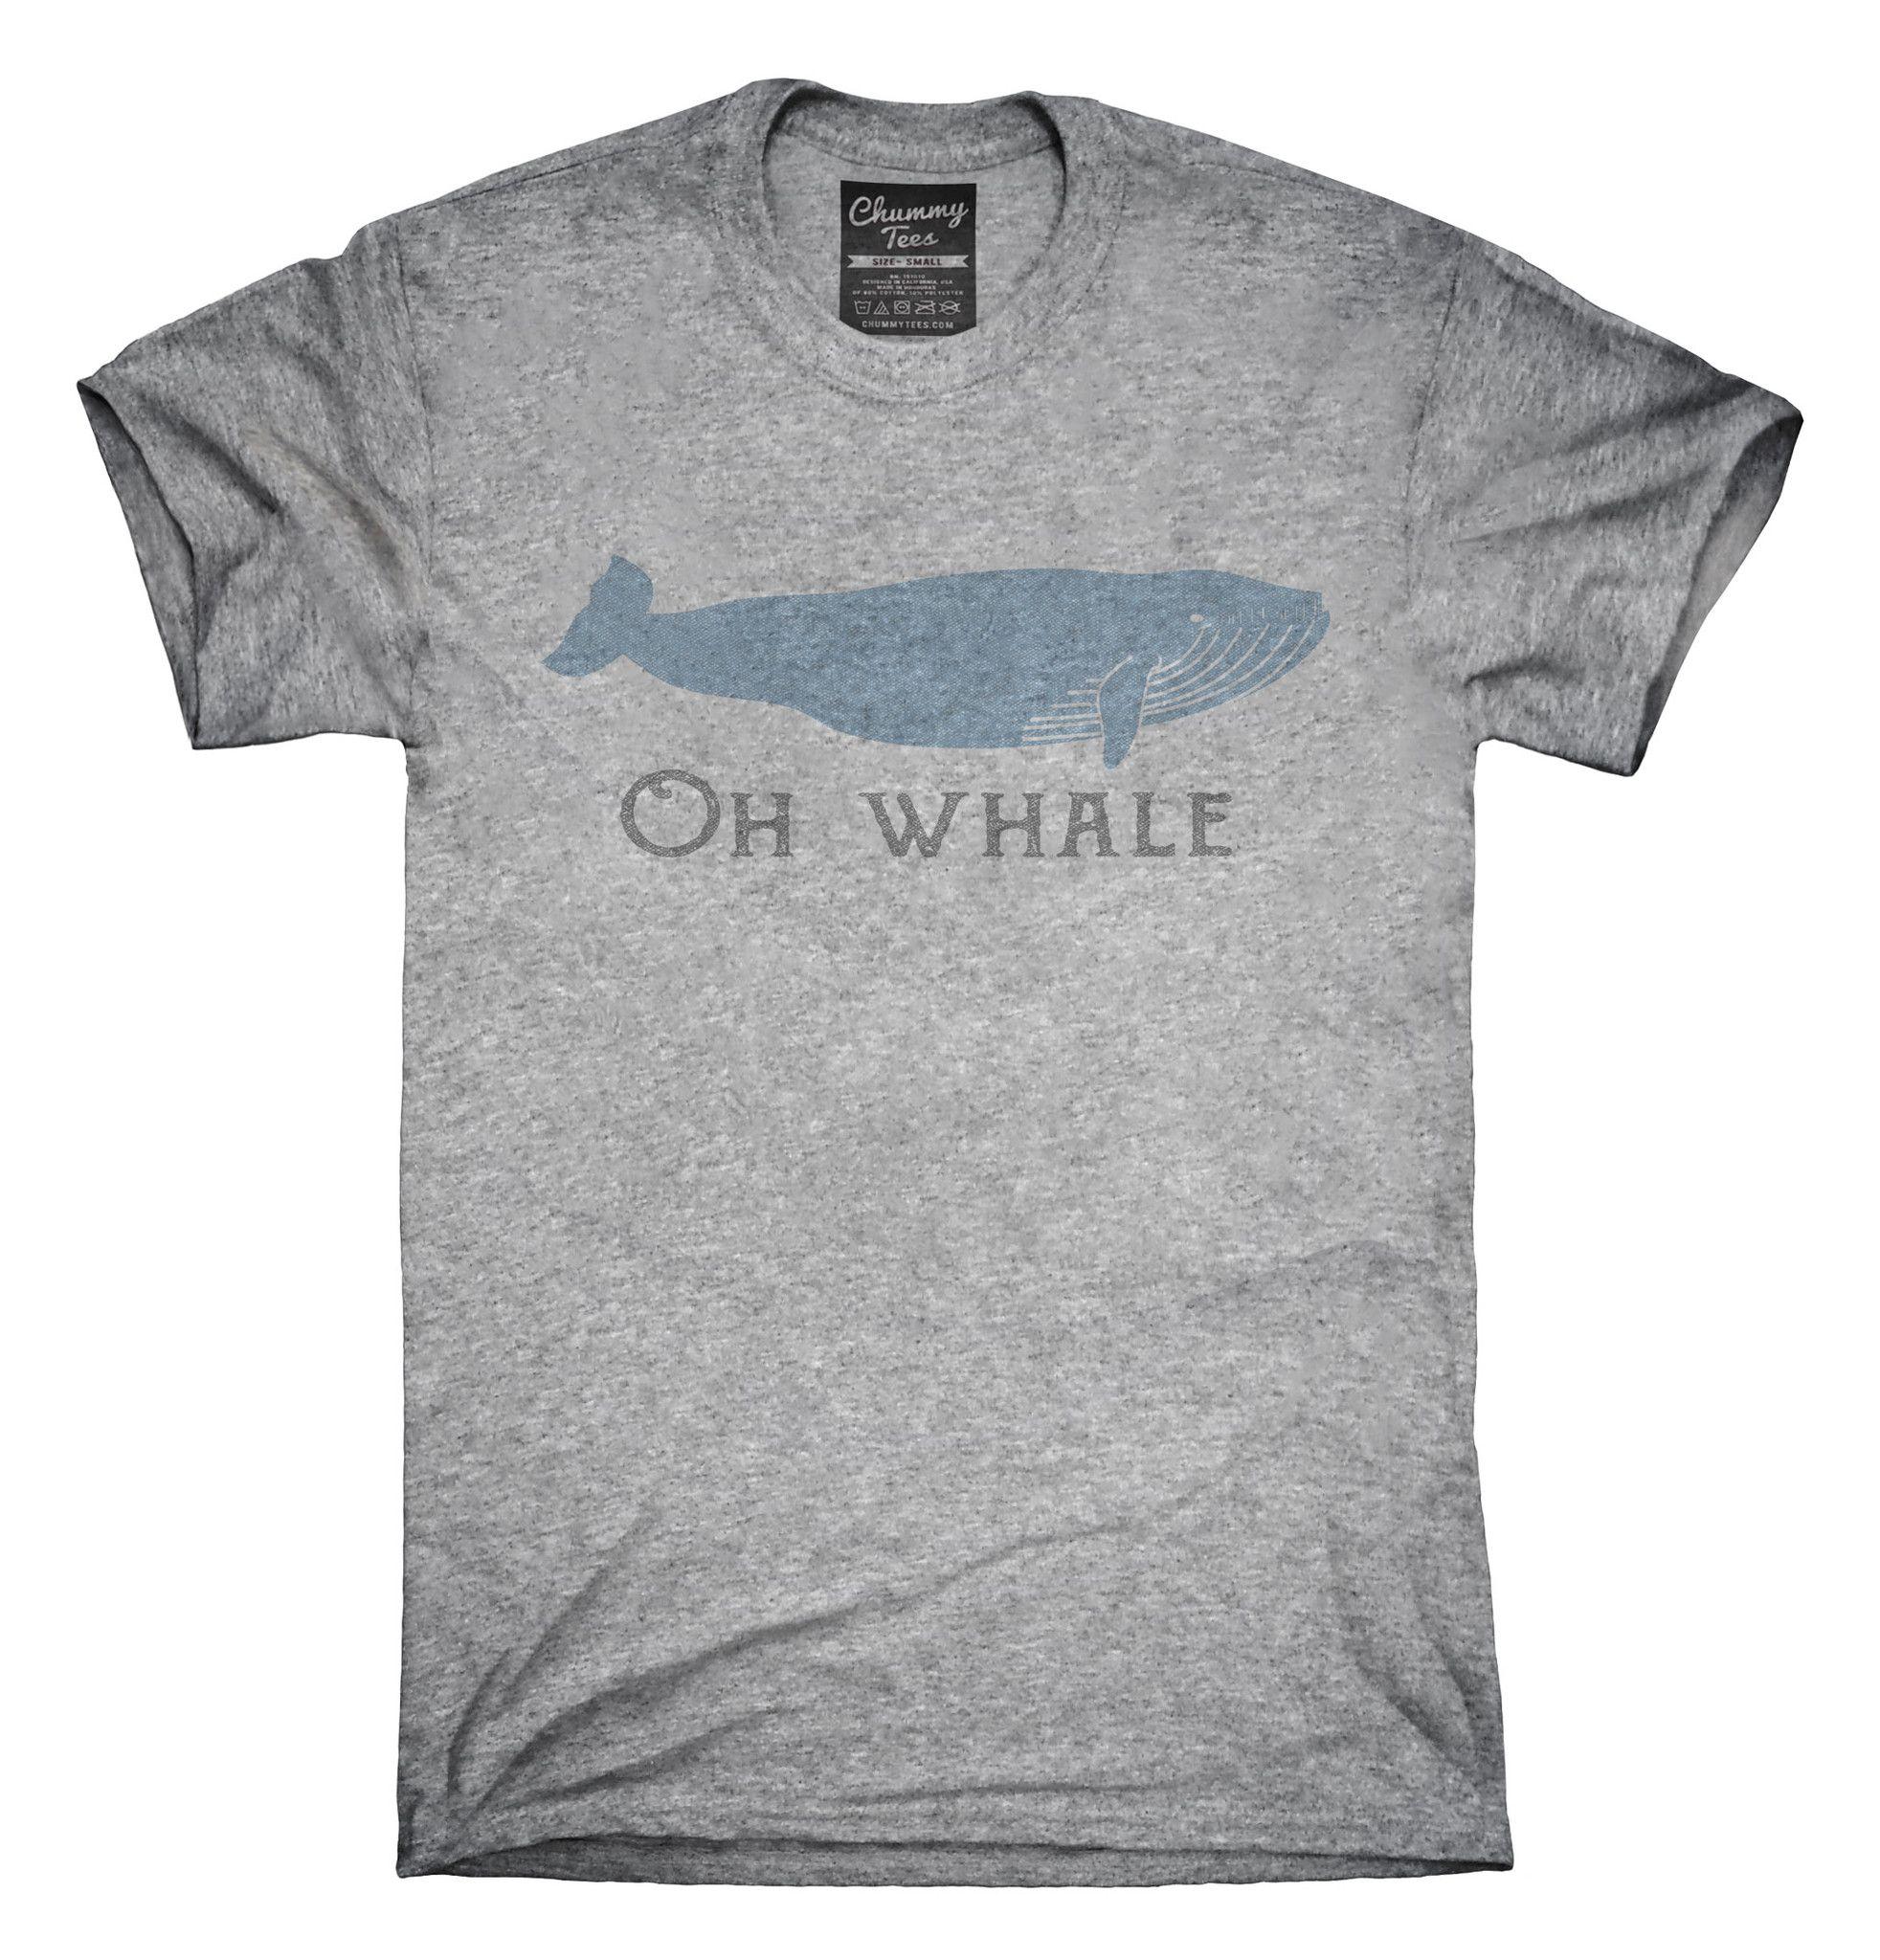 oh whale t-shirt, hoodie, tank top | skulptur, kapuzenpullis und t